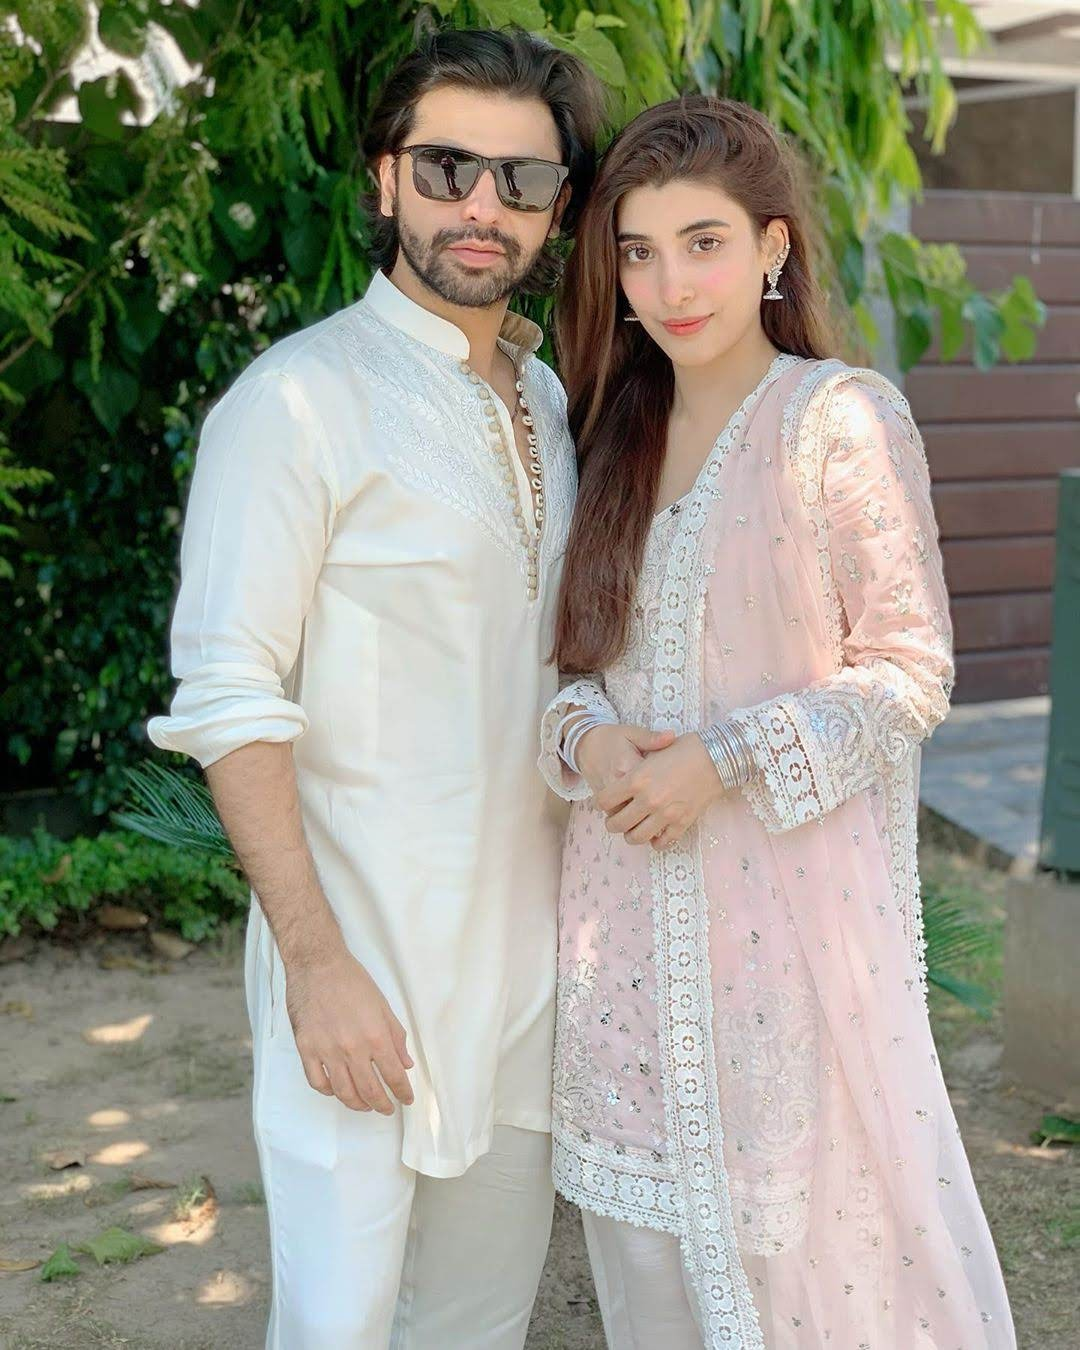 Stunning Clicks of Pakistani Celebrities on 2nd Day of Eid ul Fitr